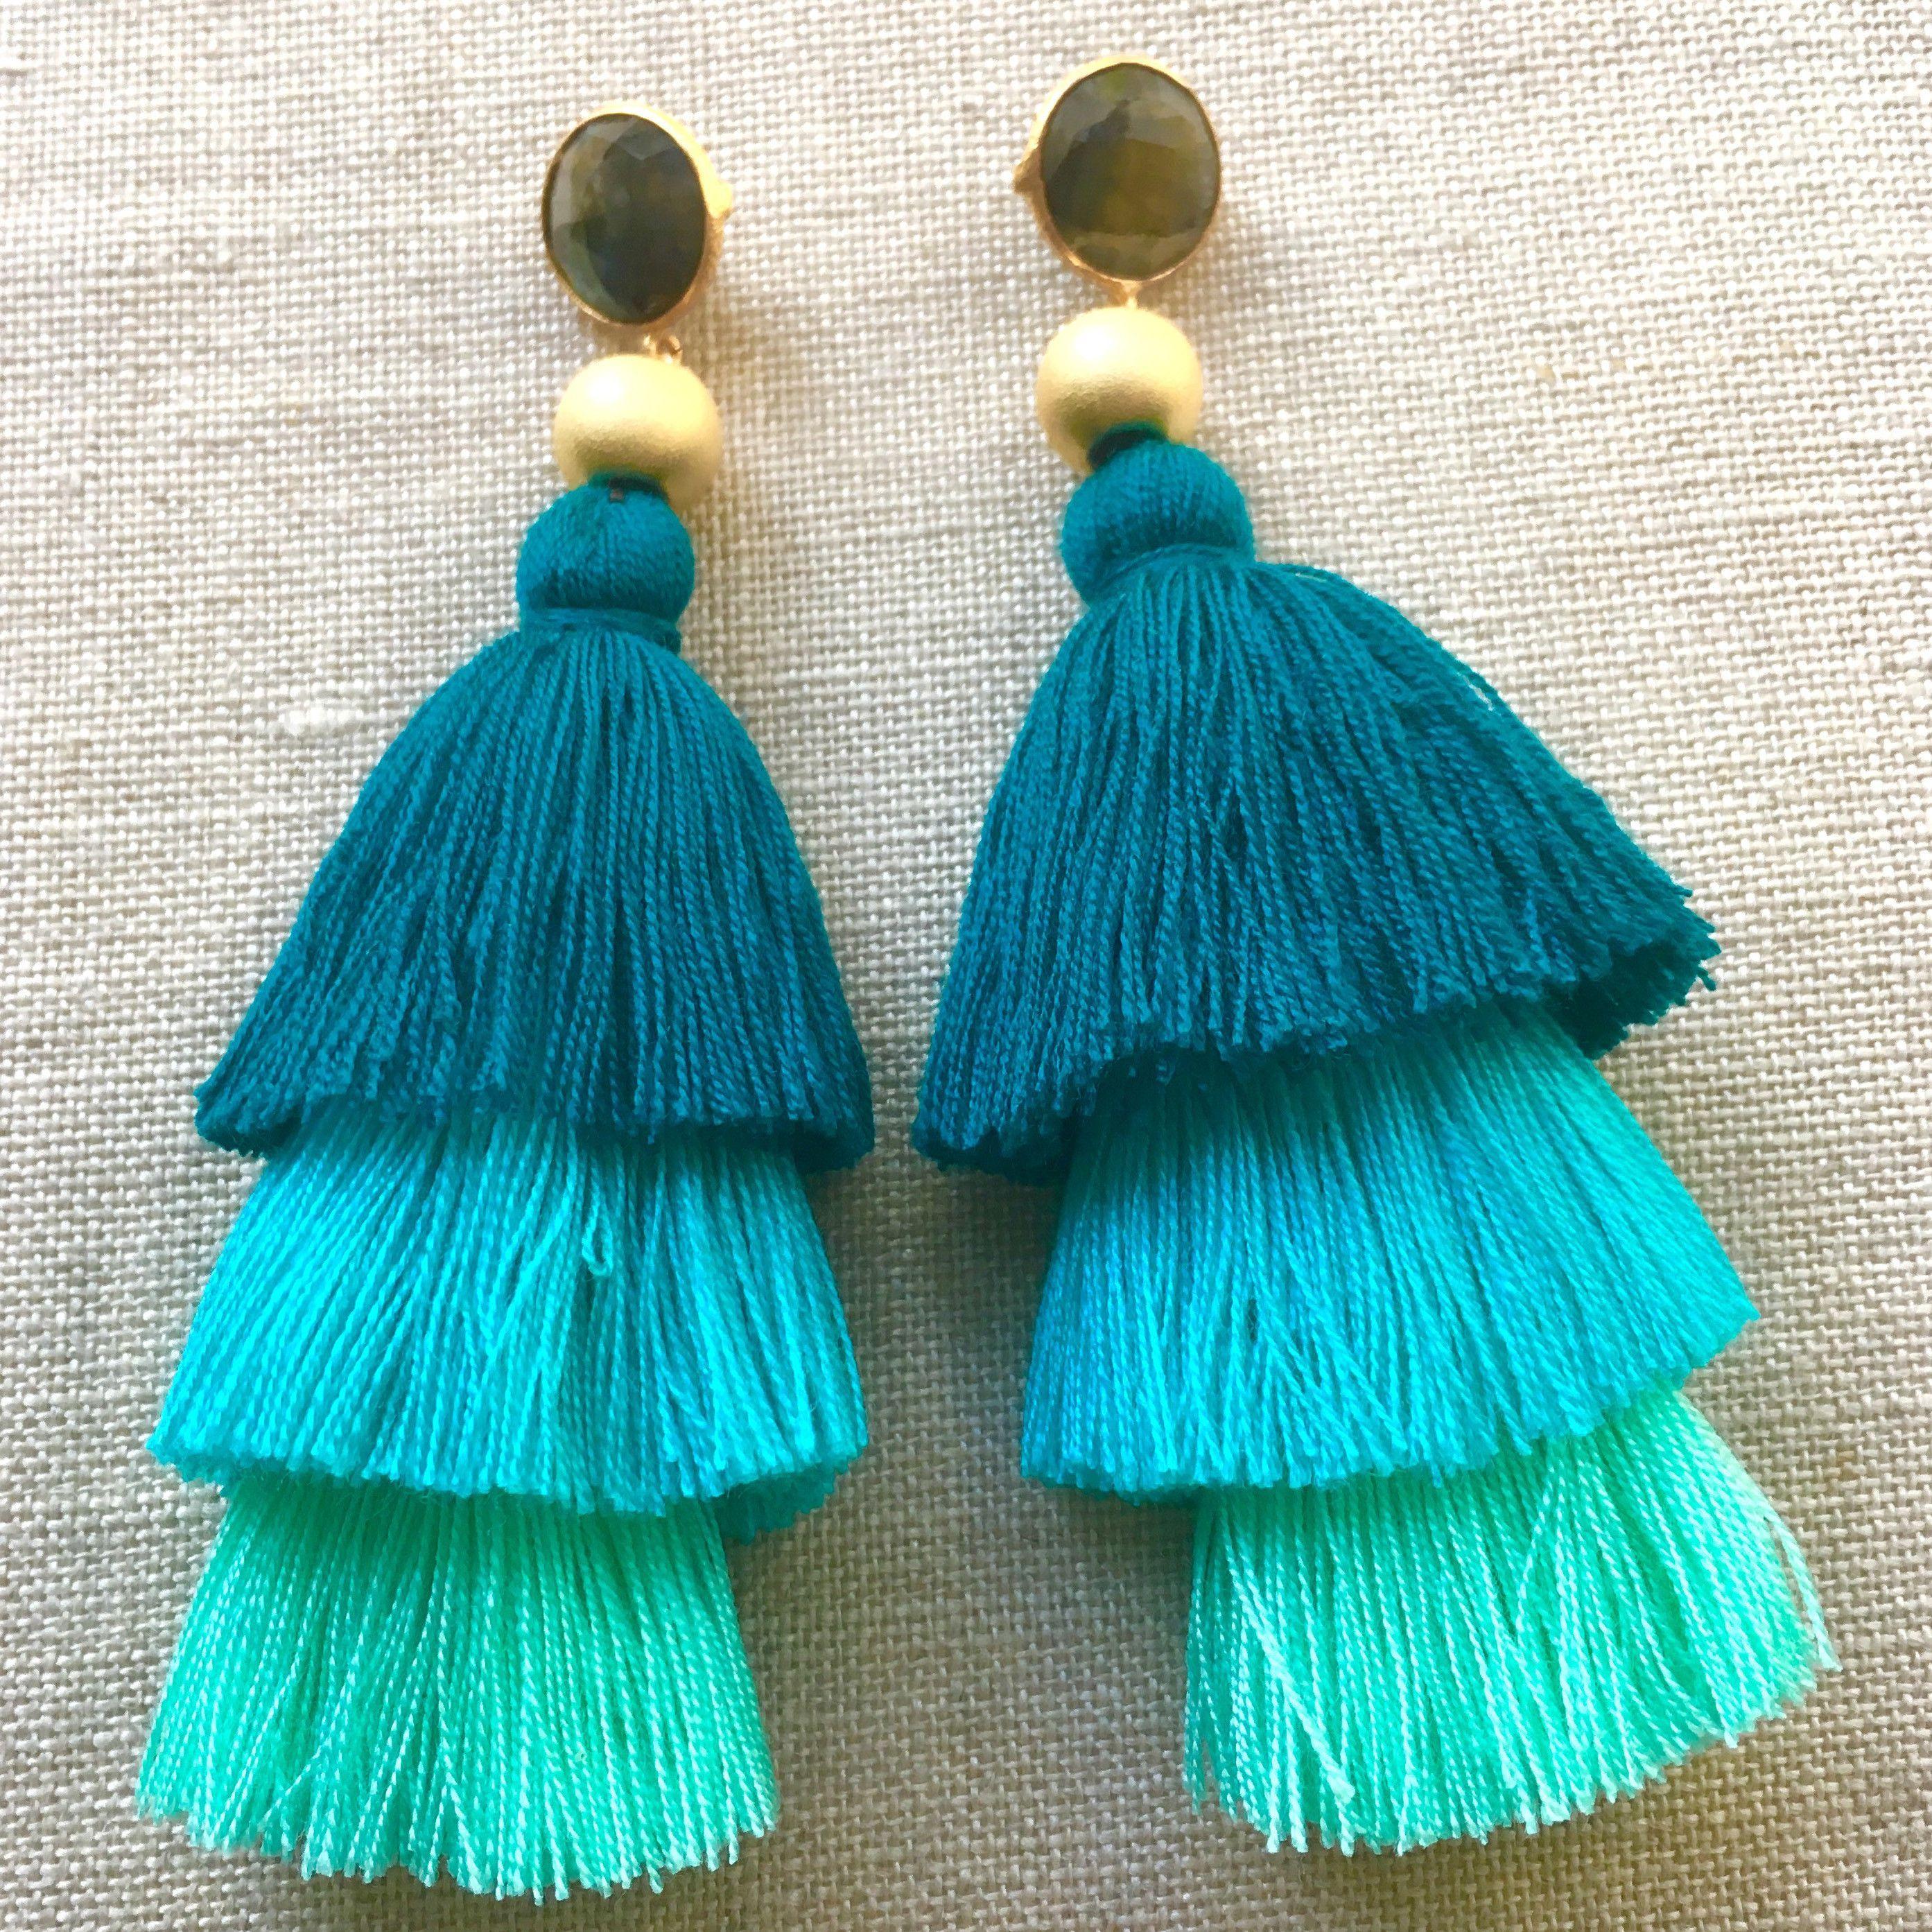 Diy Yarn Tassel Earrings